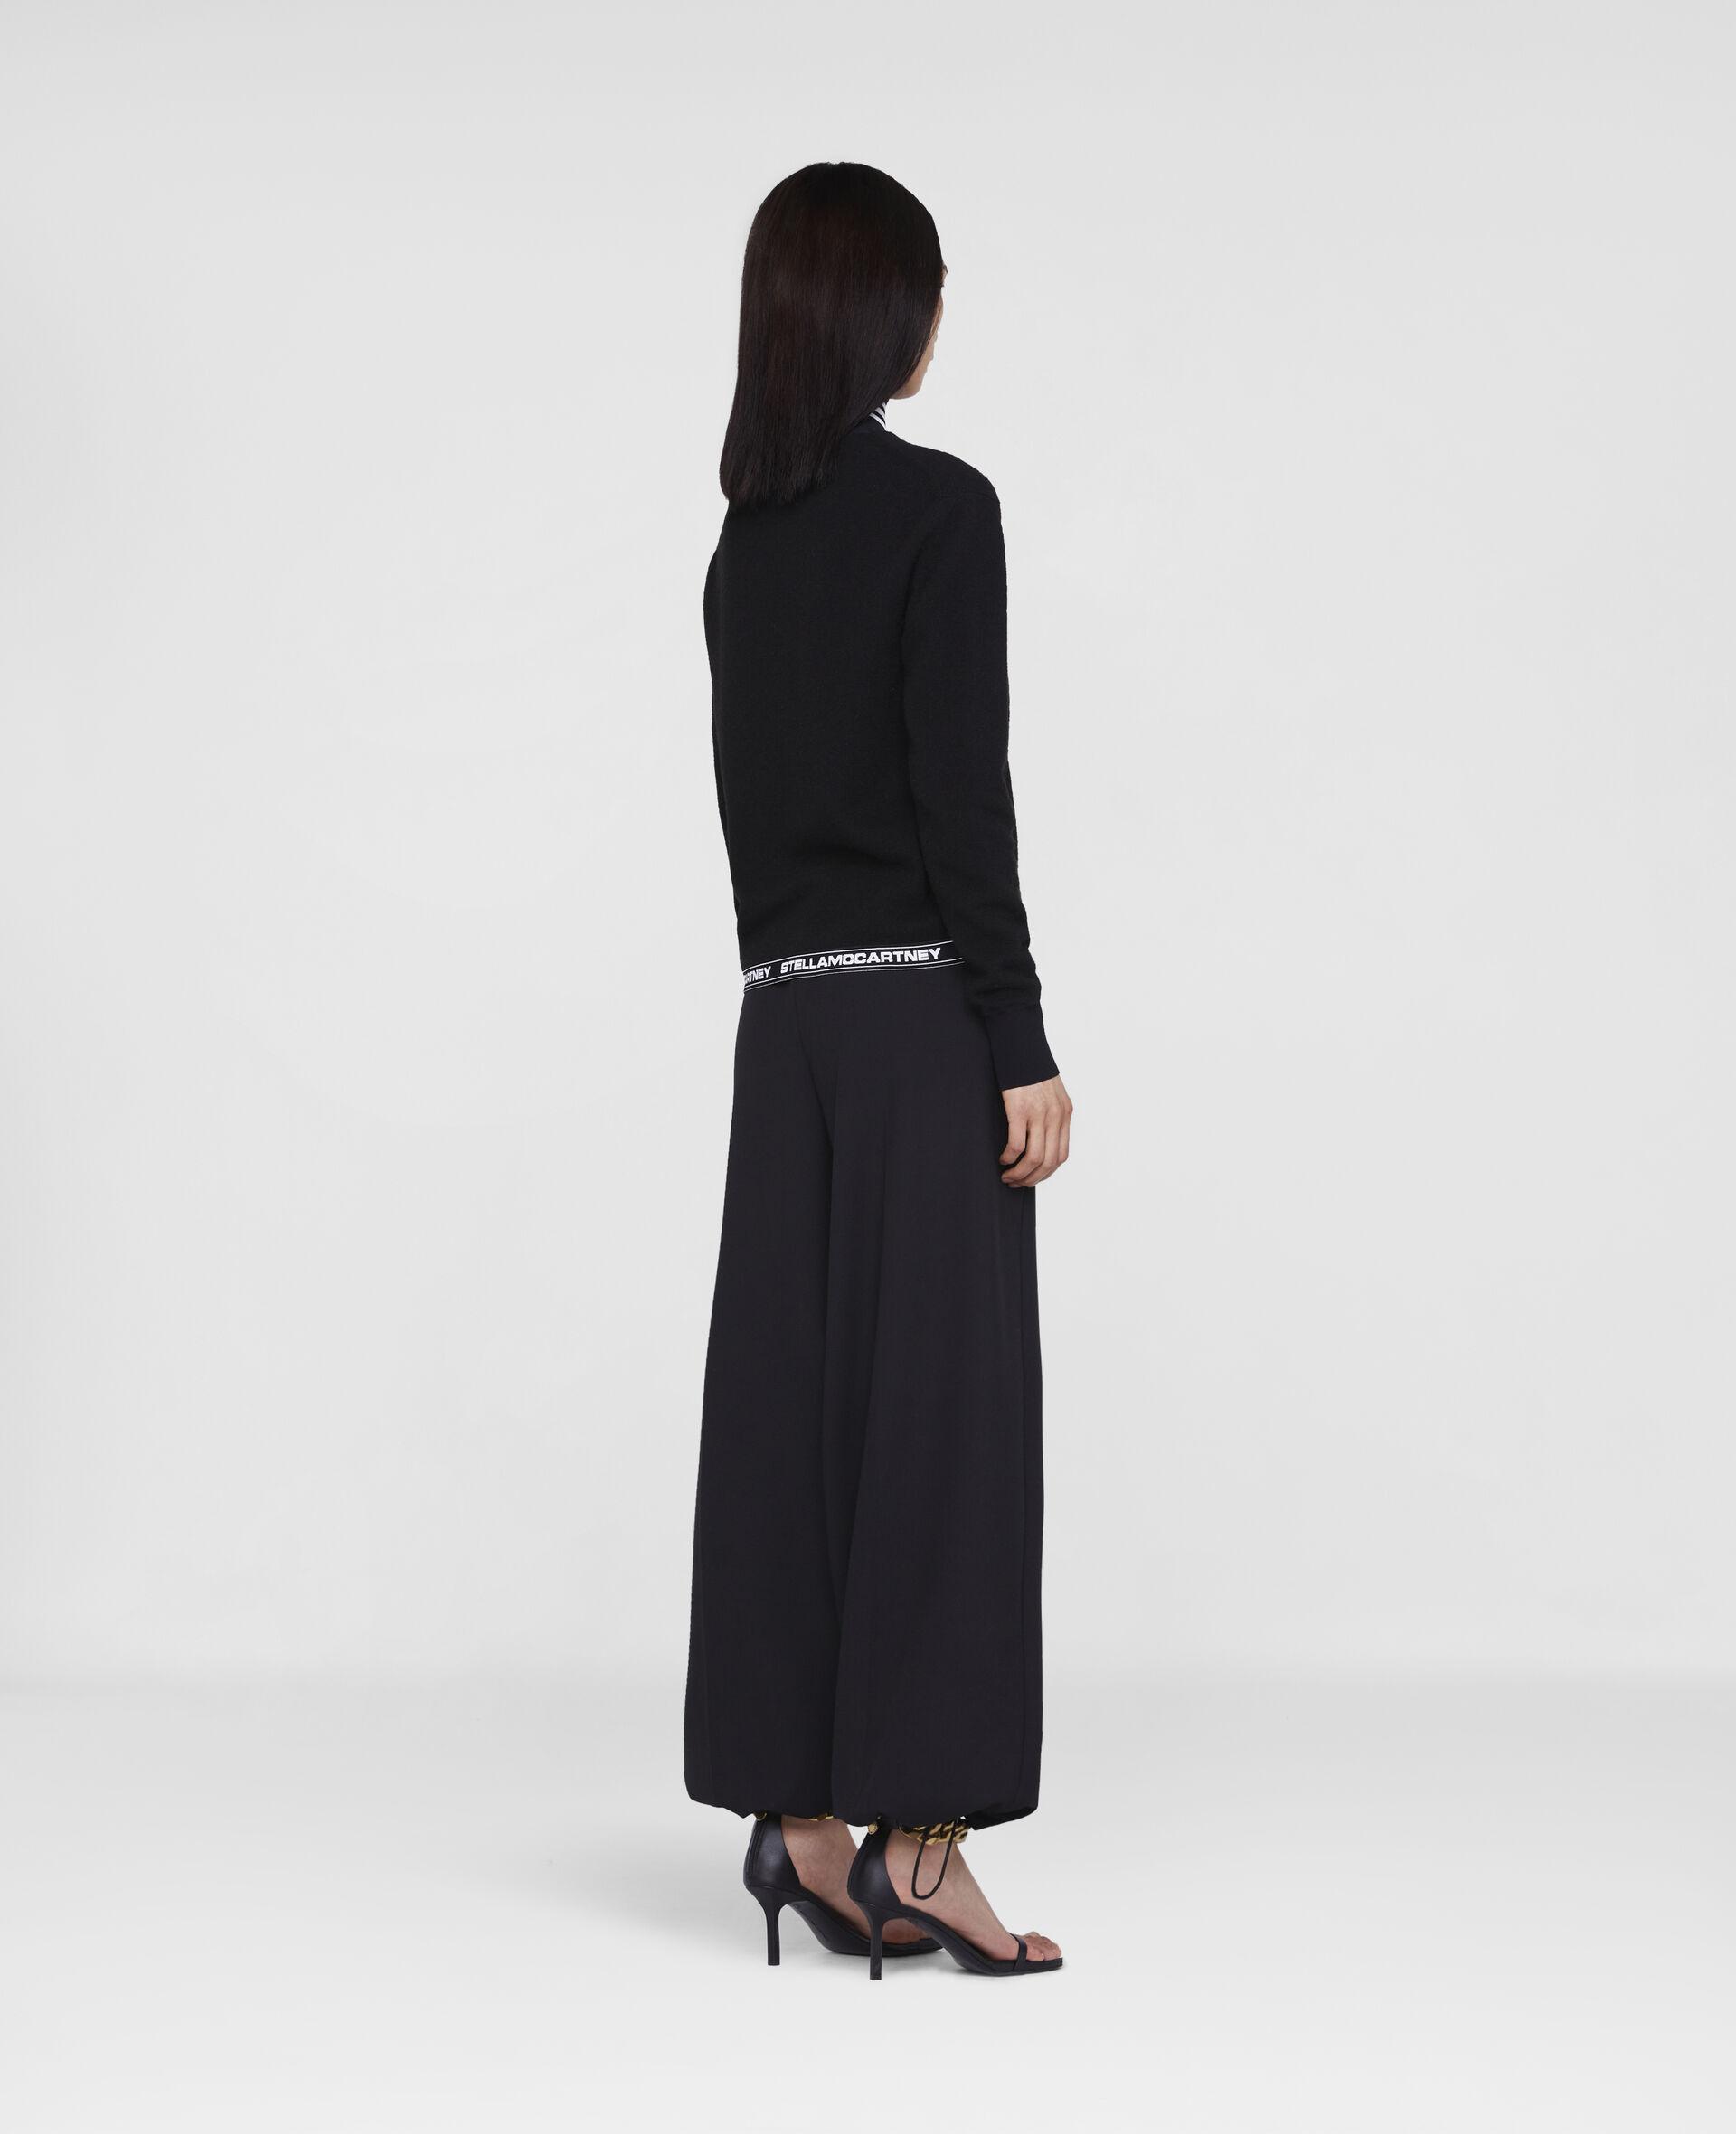 Pantaloni Sartoriali con Logo Stella -Nero-large image number 2